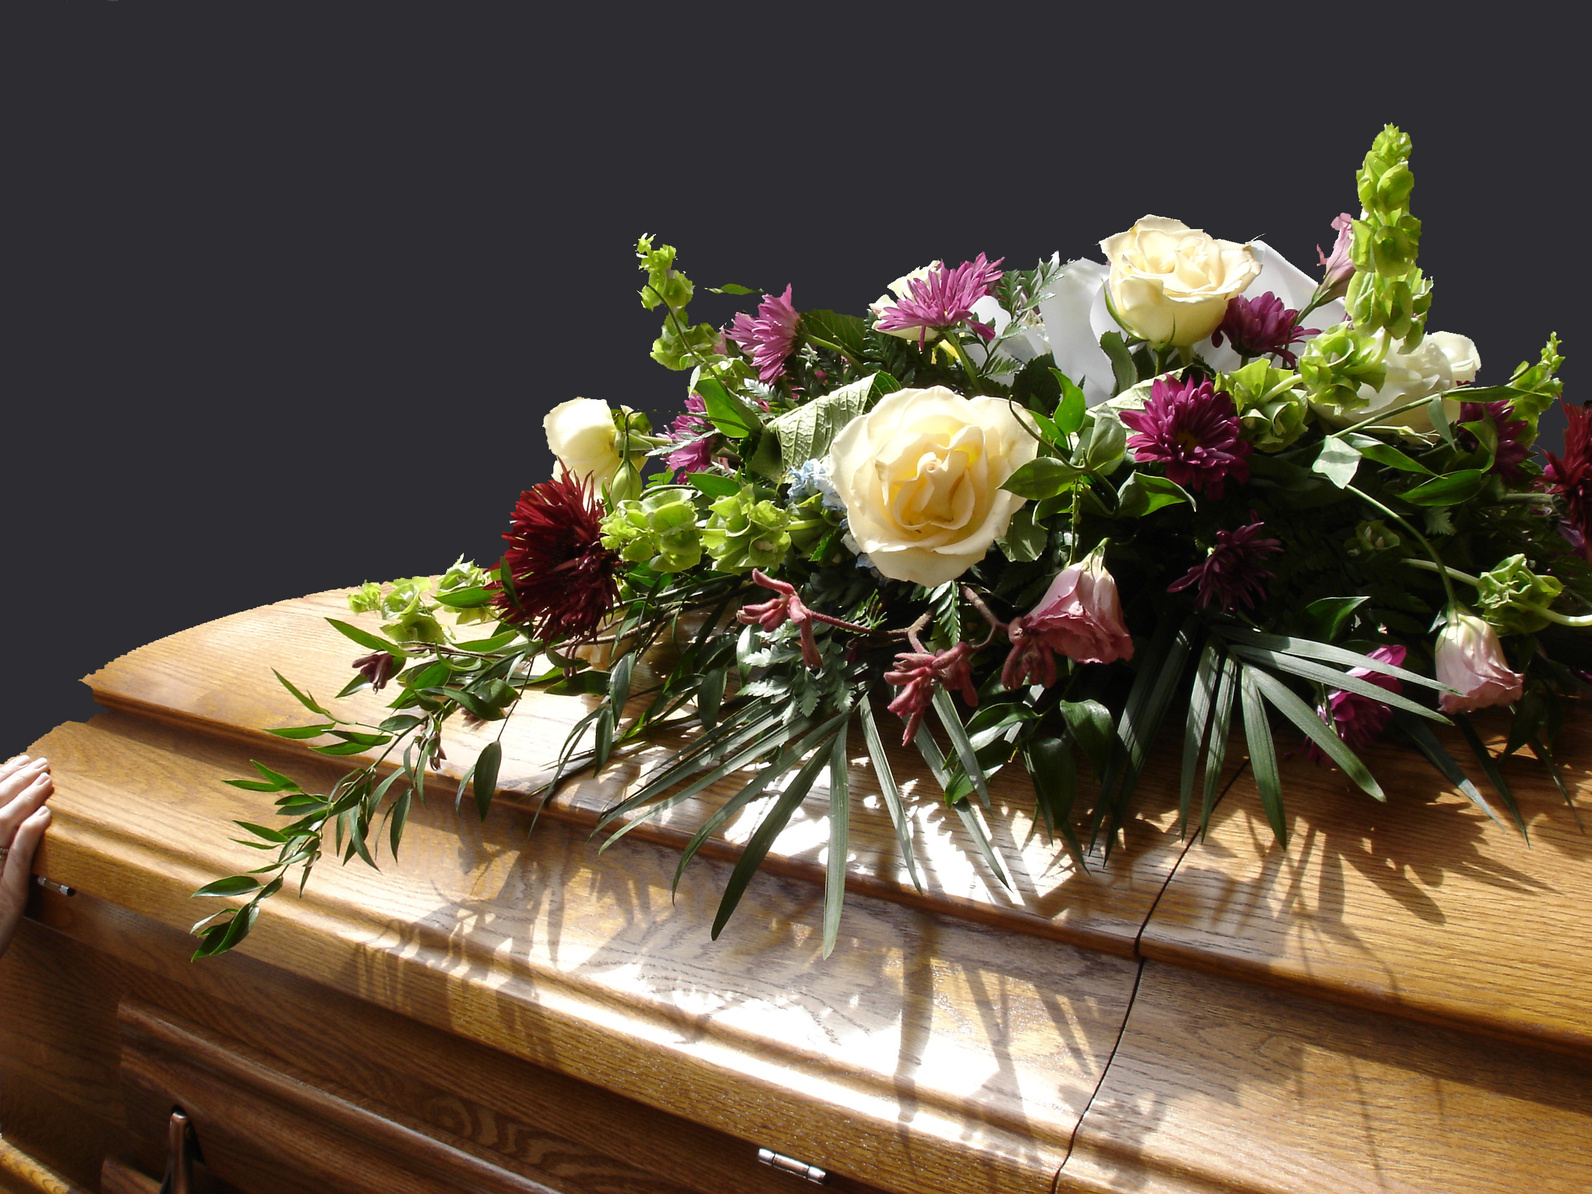 Send Online Flowers To Uk England Best Florist Windsor Berkshire